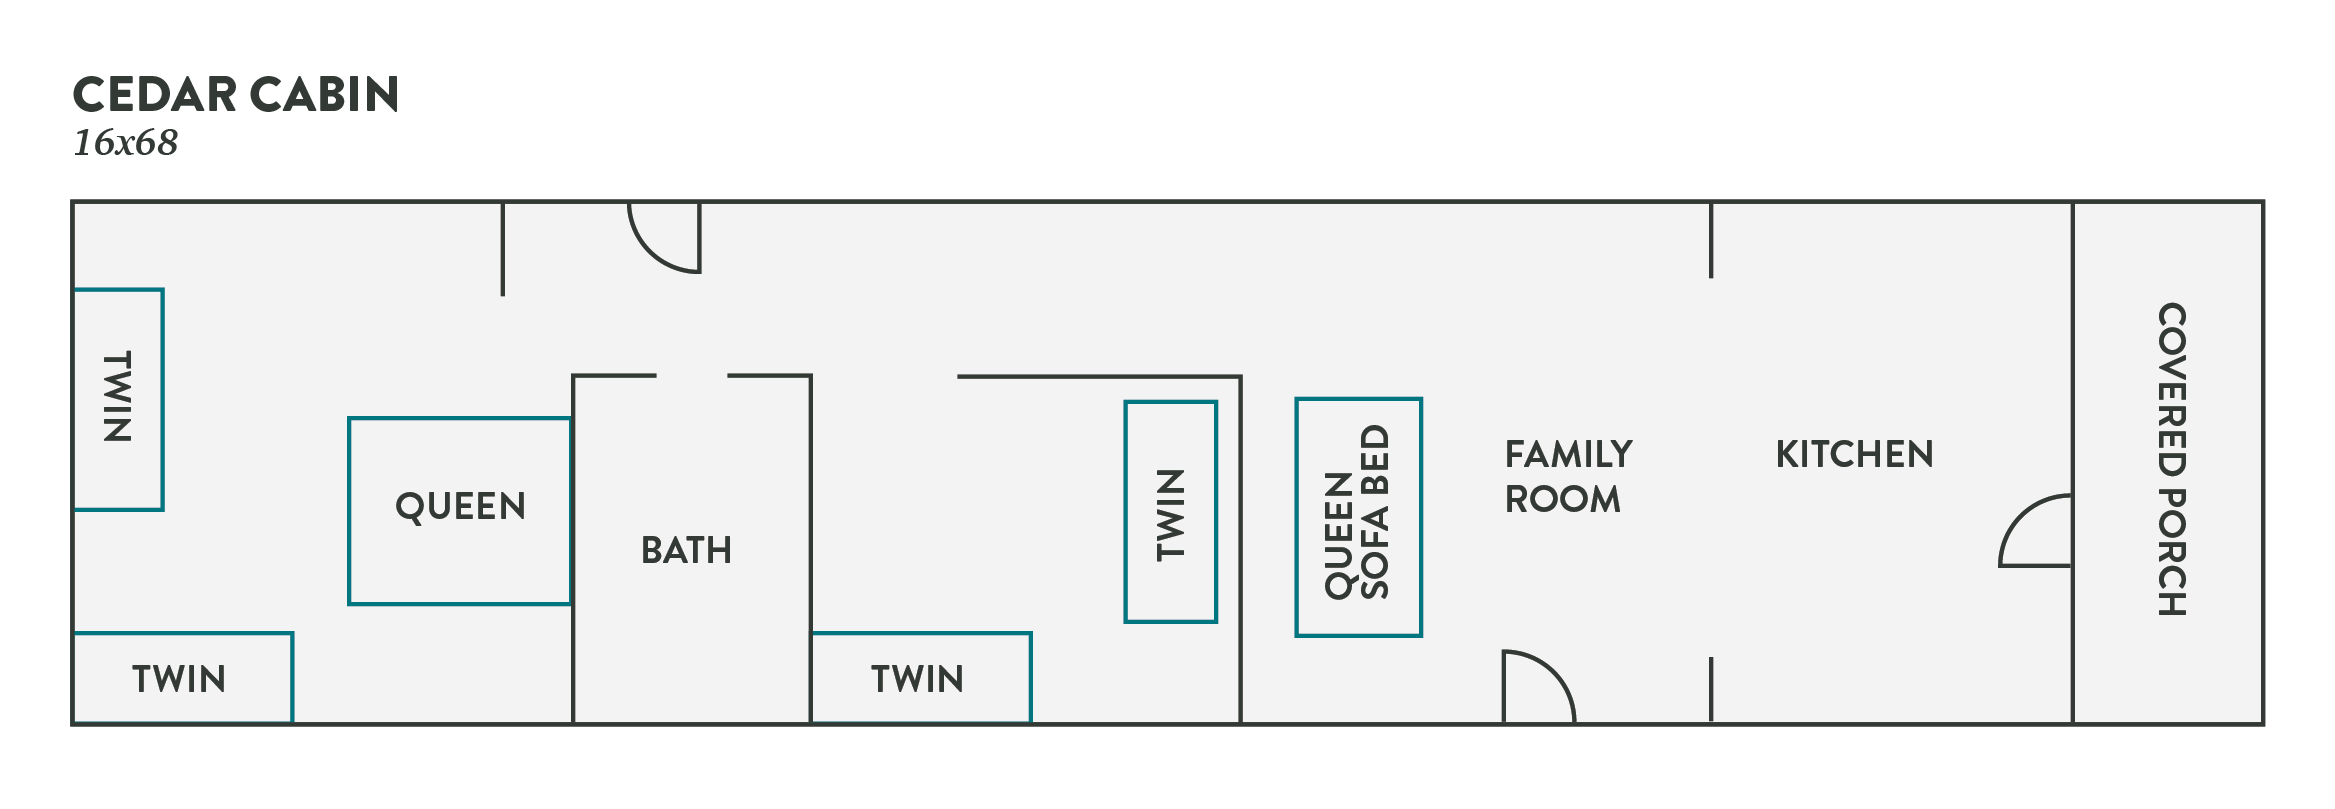 LR_Floorplans-11.png